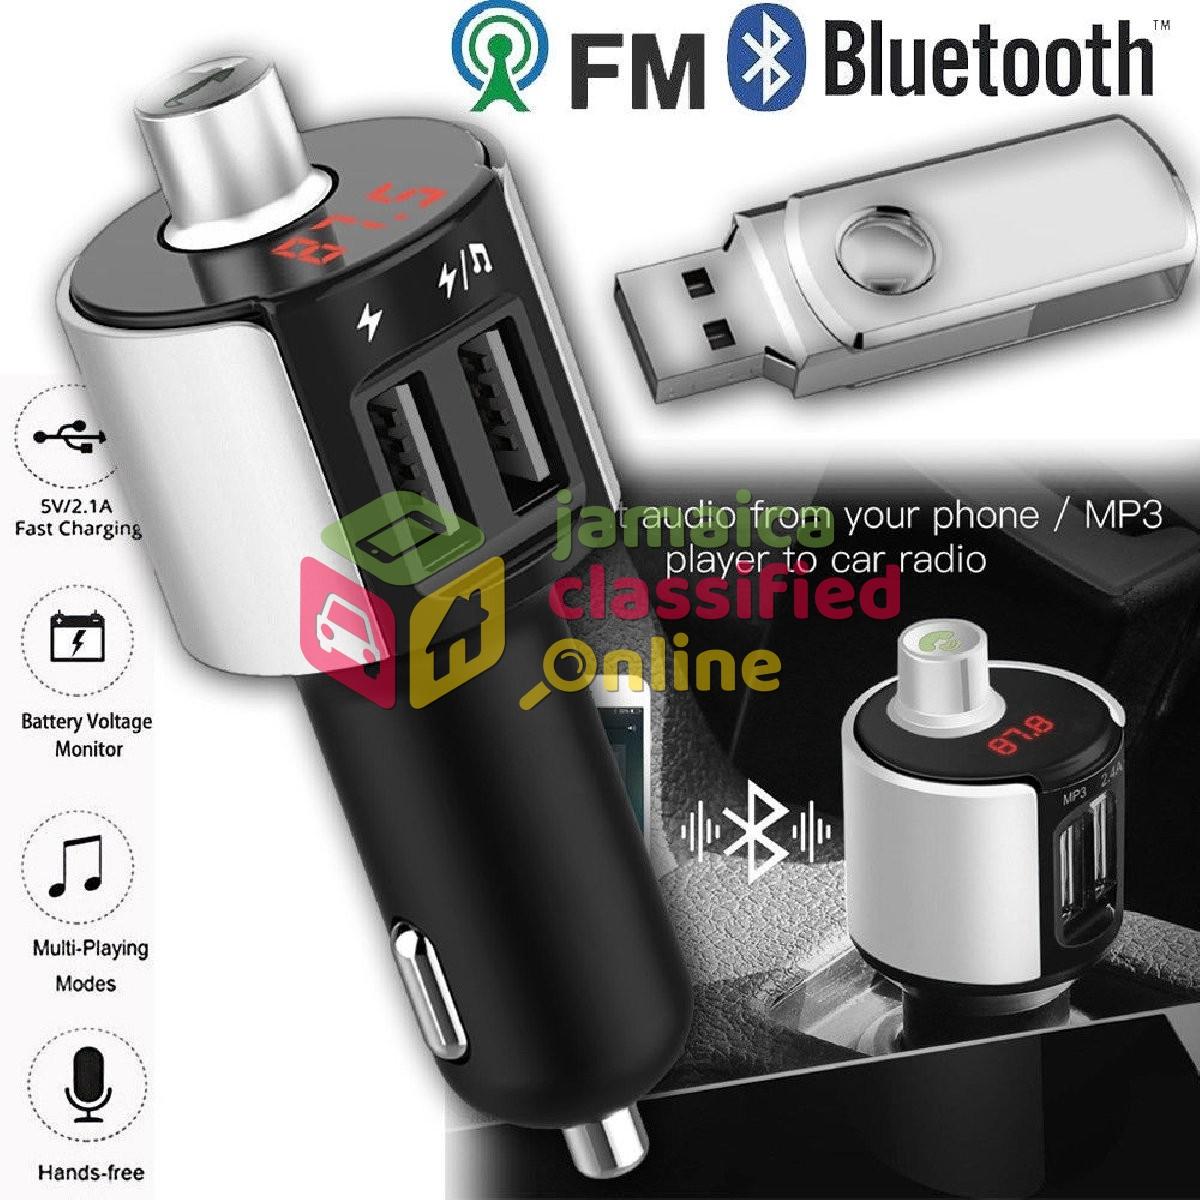 Bluetooth Car FM Transmitter Wireless Radio Adapte for sale